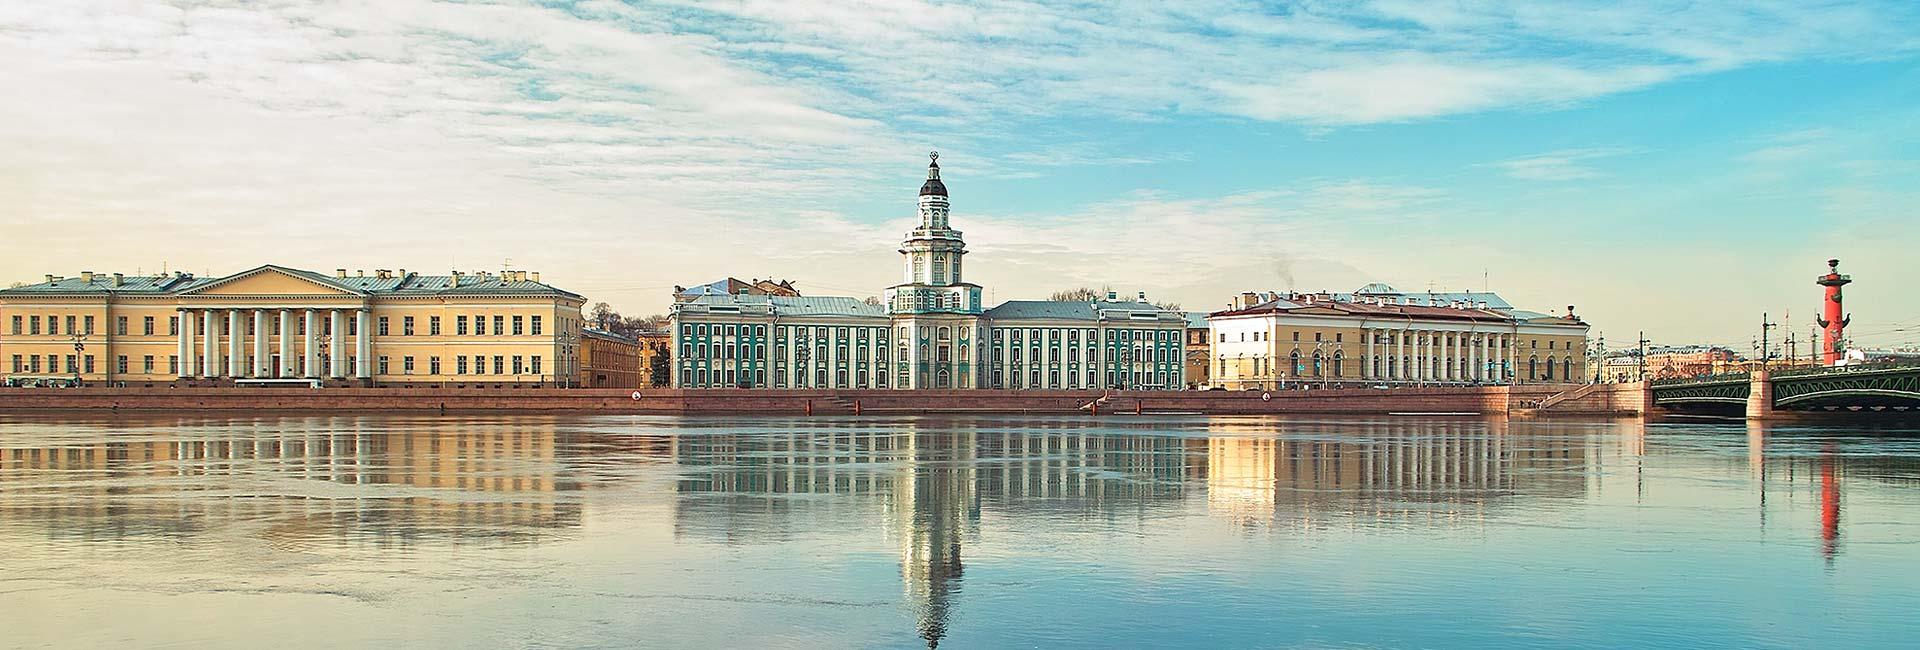 Saint Petersburg Apartments Header Image